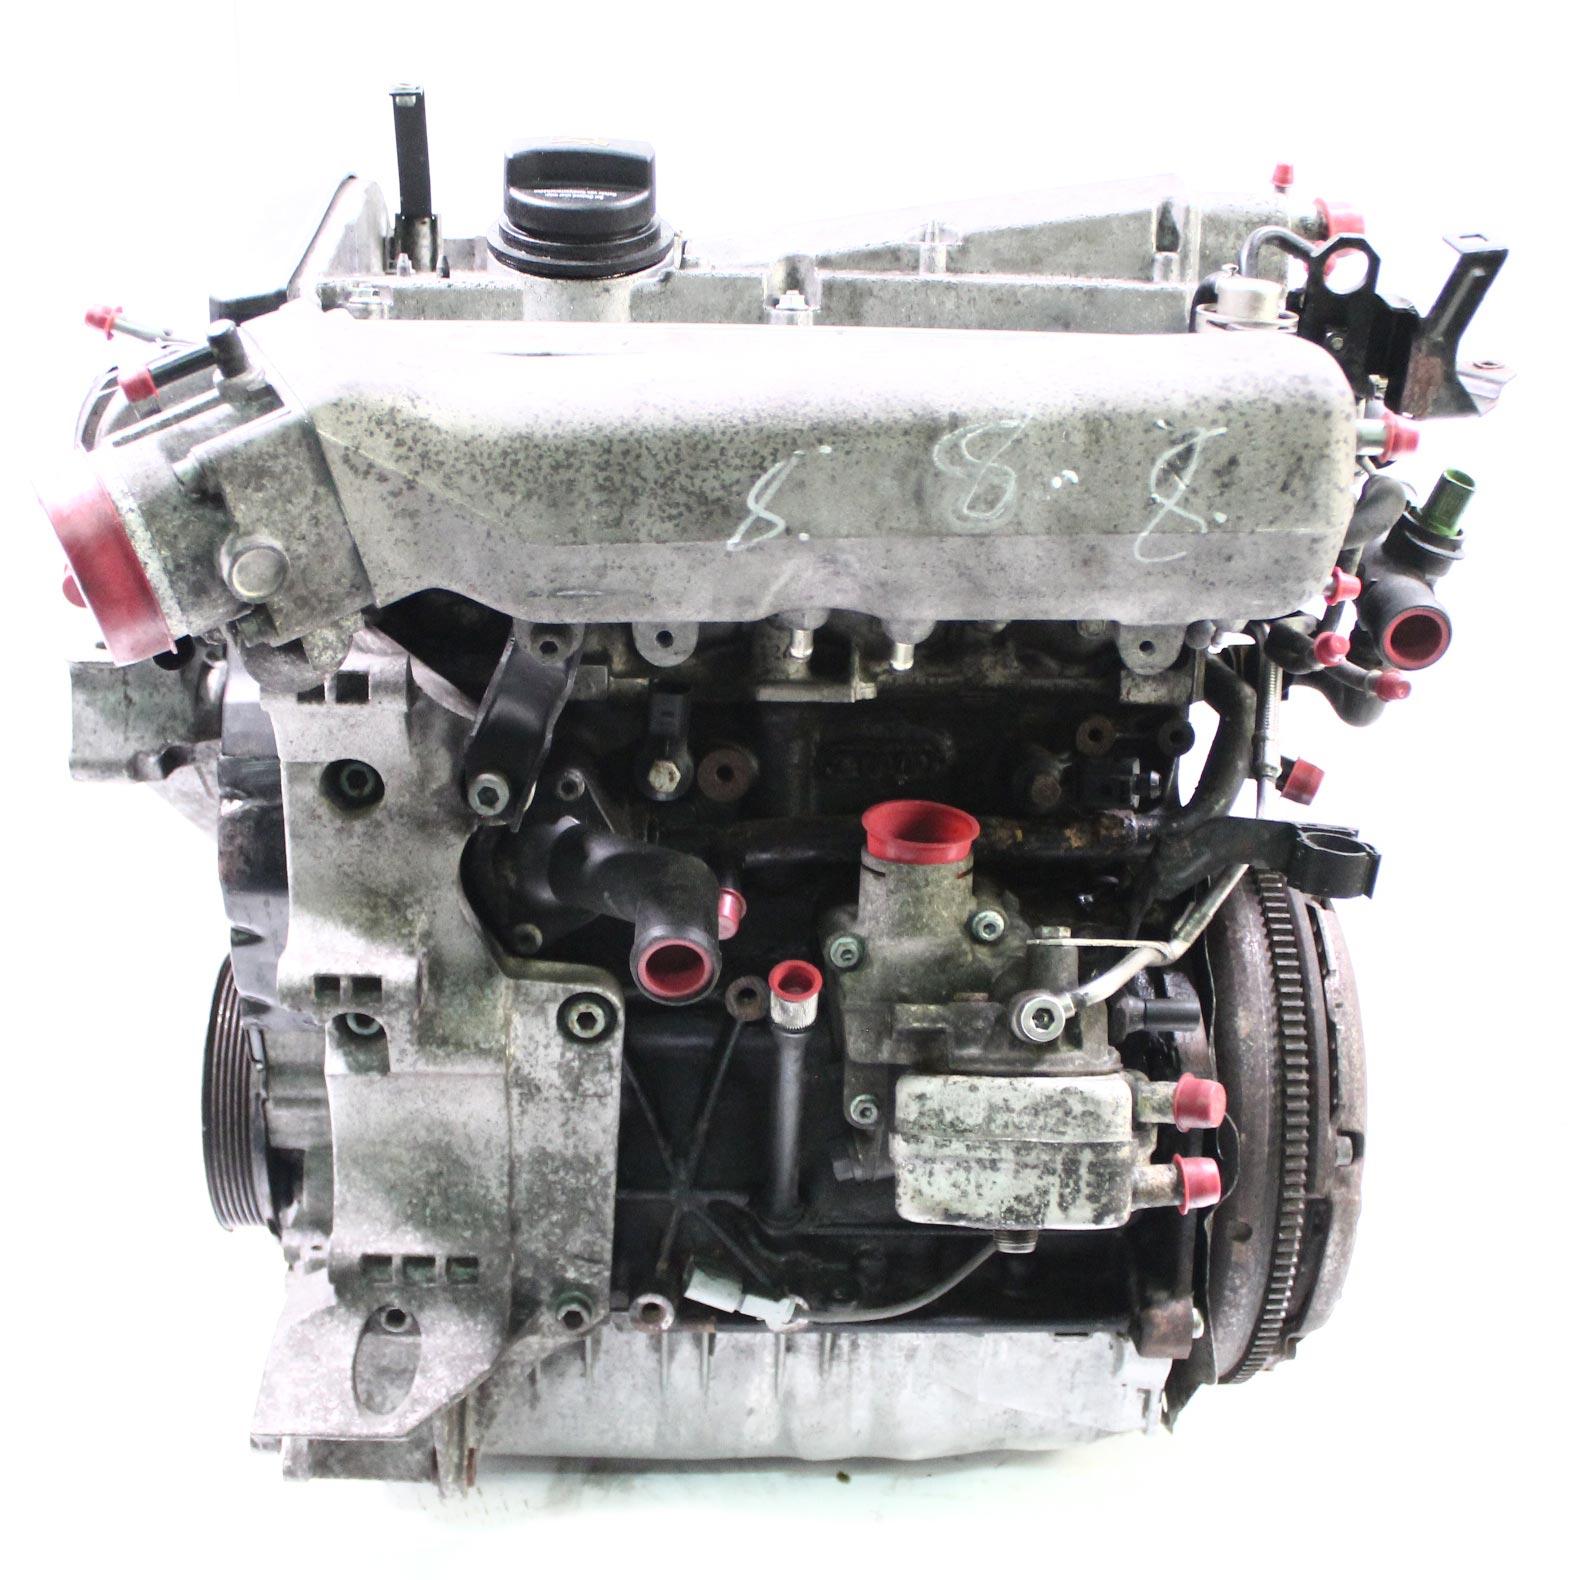 Motor 2003 Seat Audi A3 TT Leon 1,8 T Benzin ARY 180 PS